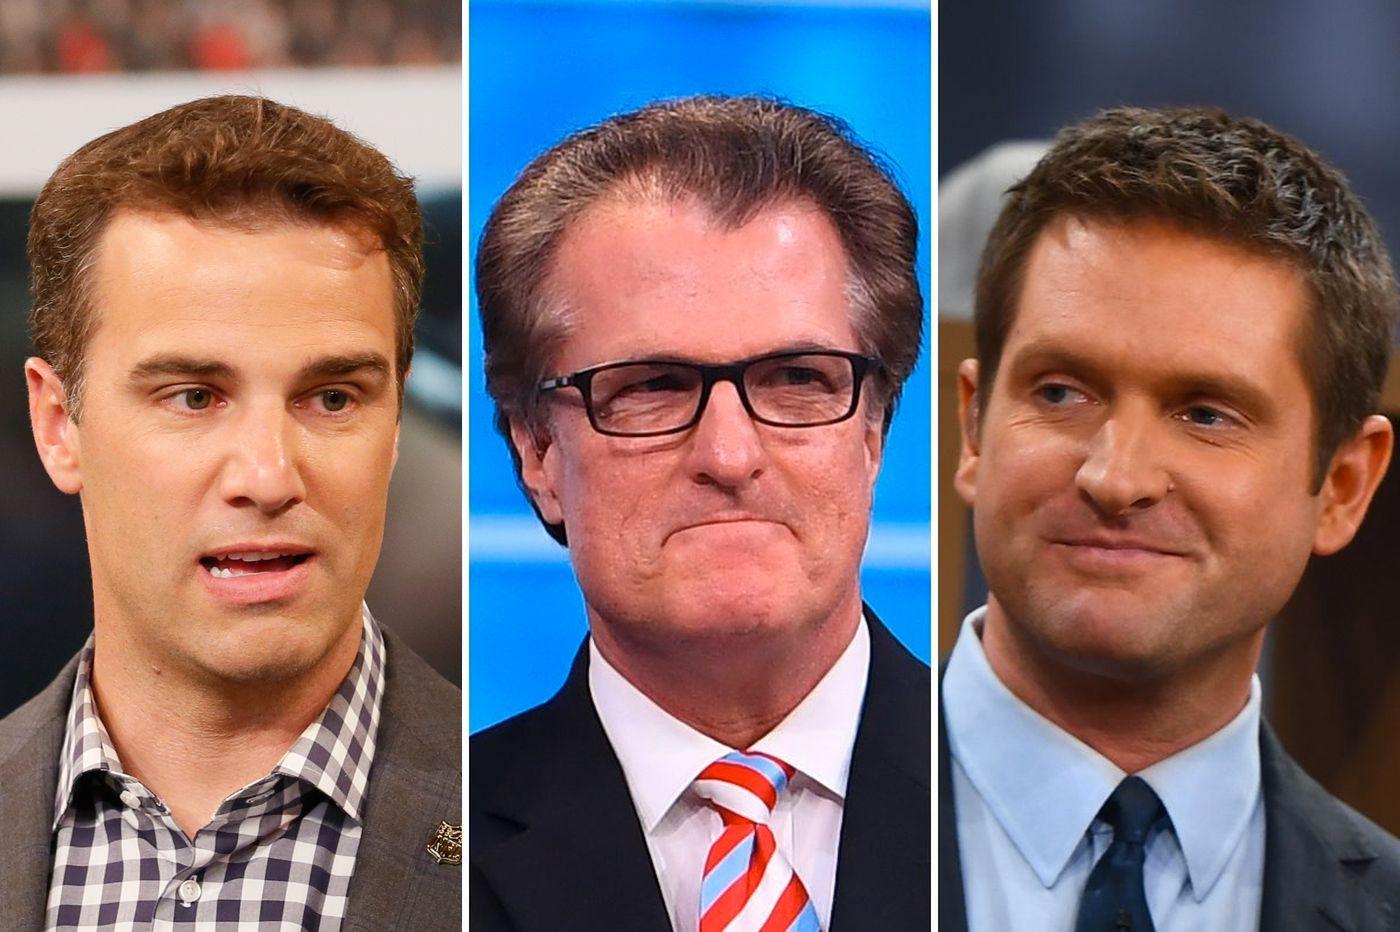 NFL draft 2019: How many picks did Mel Kiper, Todd McShay, and Daniel Jeremiah actually get right?